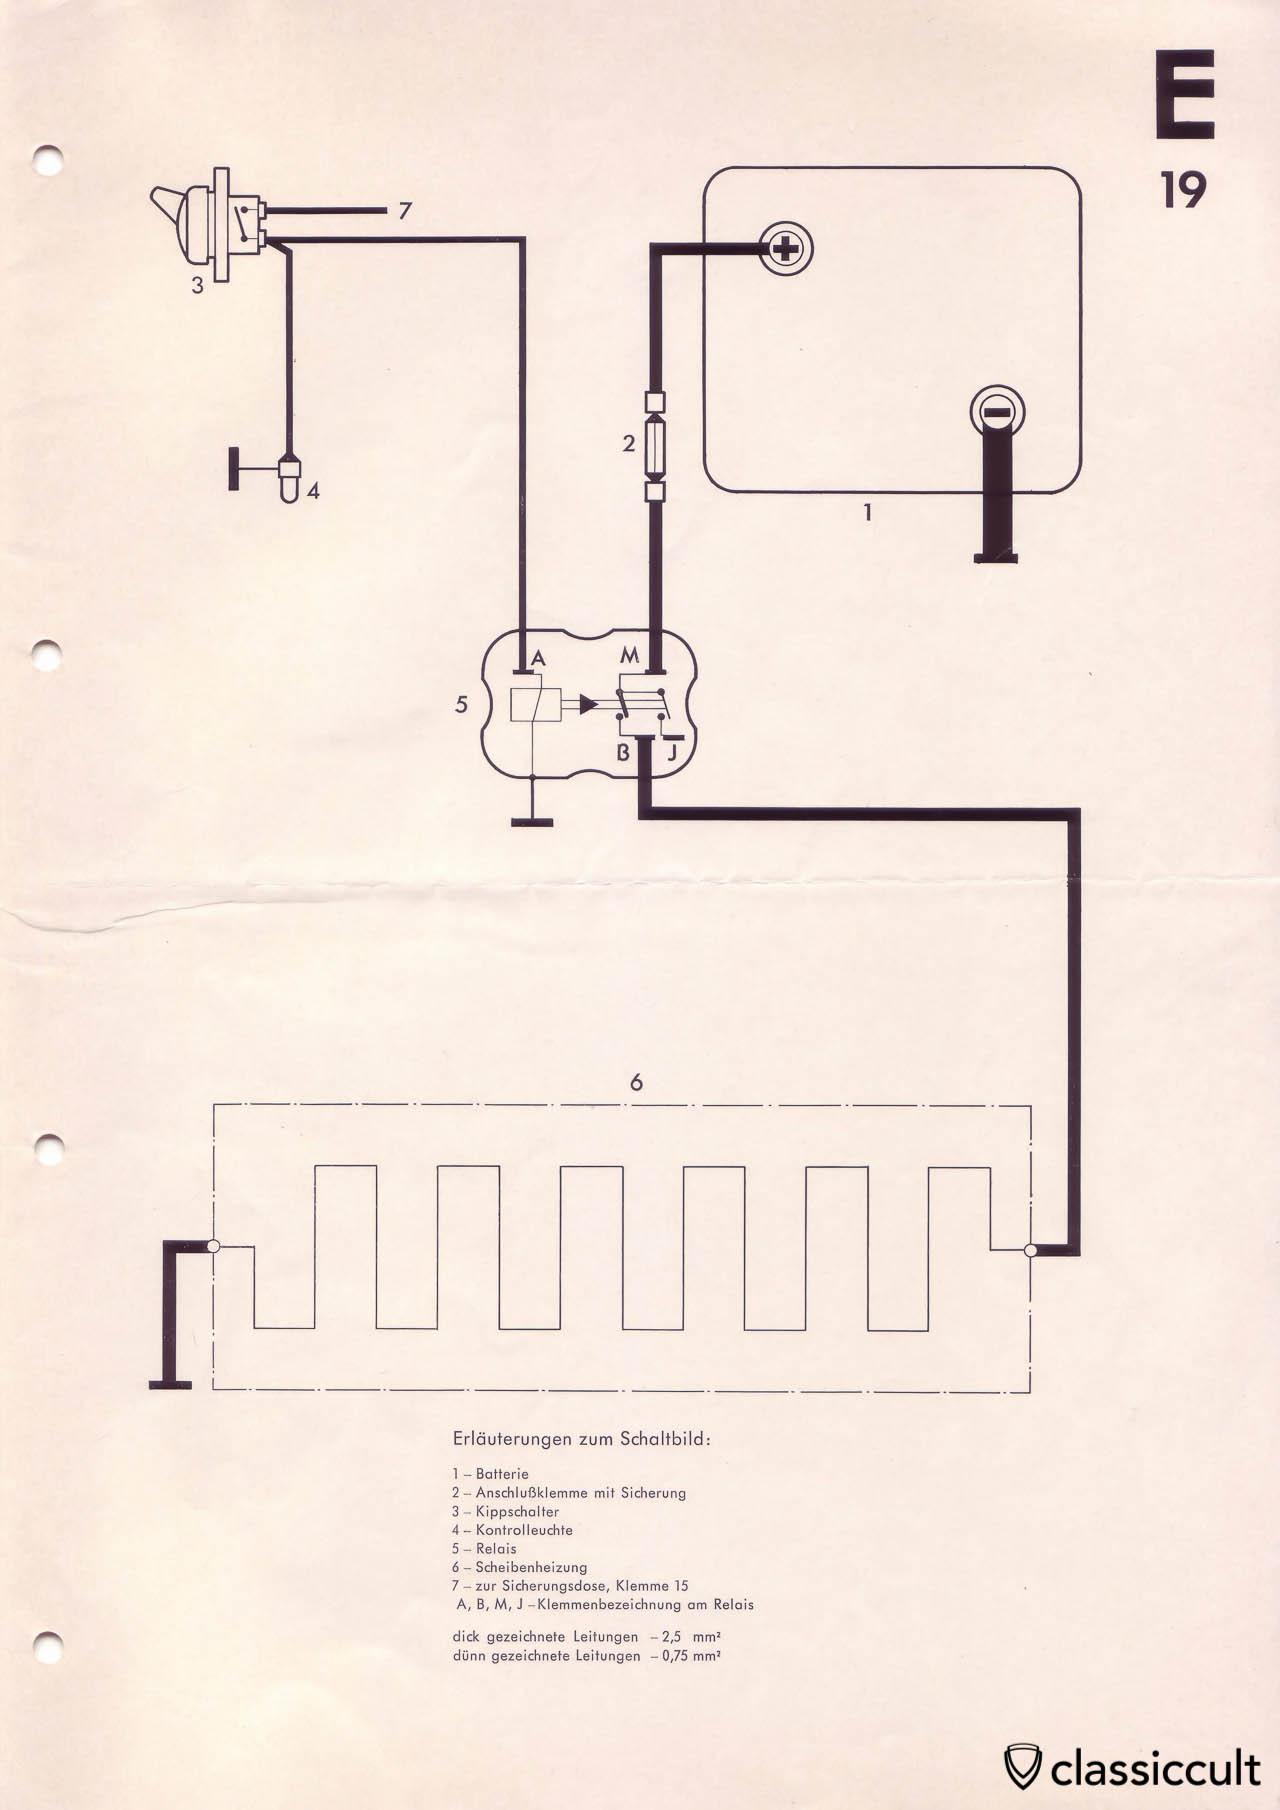 Heated rear window in classic VW wiring instructions.